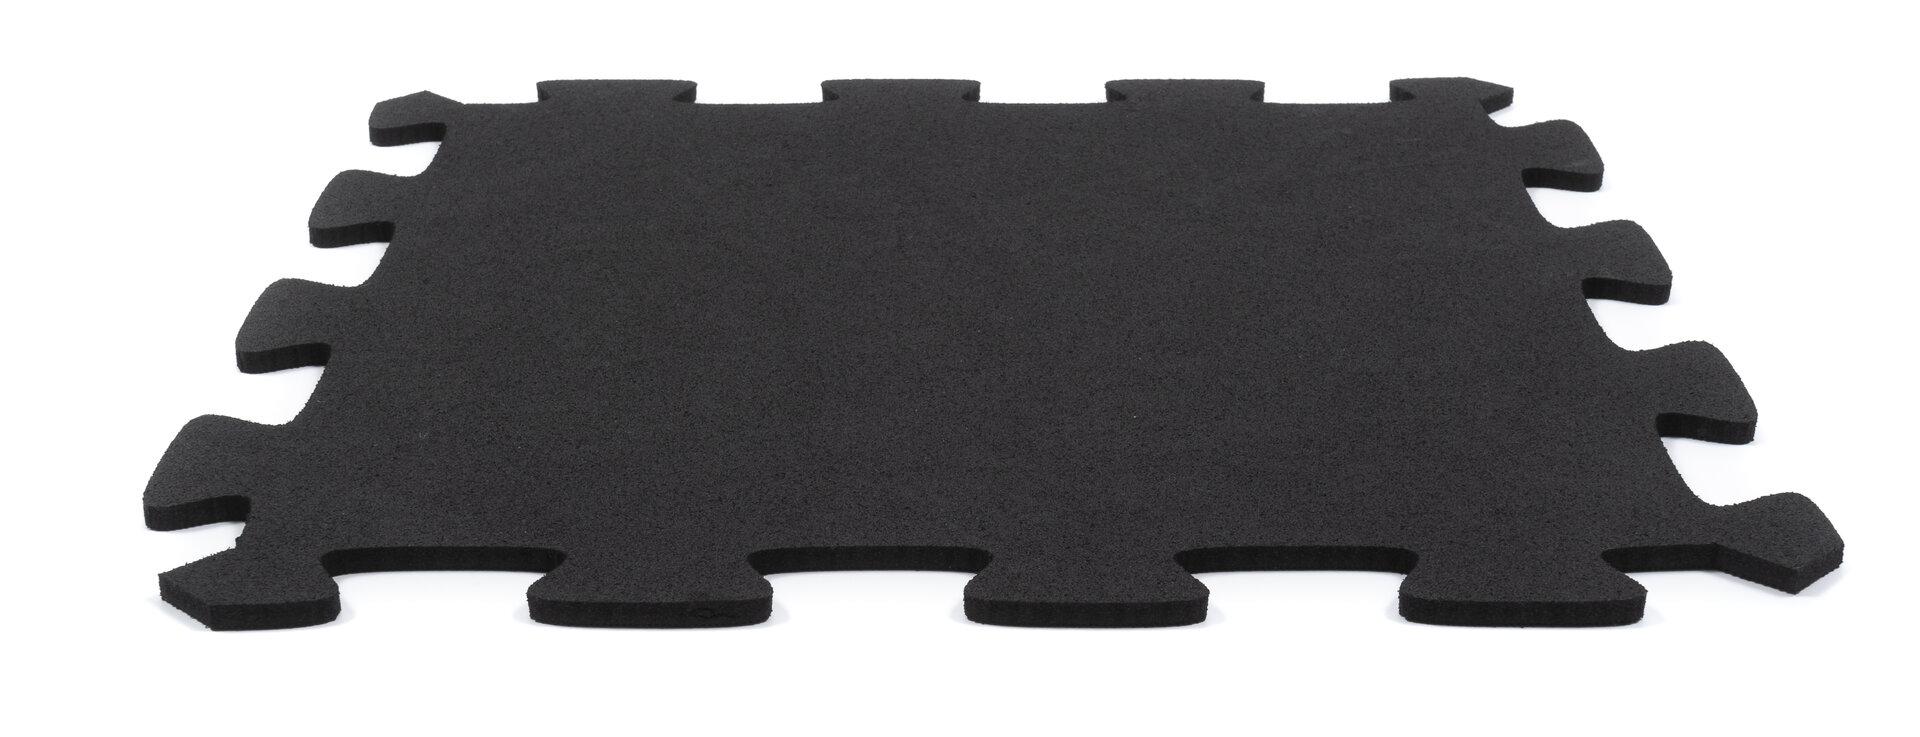 Černá gumová puzzle terasová dlažba FLOMA Comfort Tile - délka 40 cm, šířka 40 cm a výška 2,2 cm